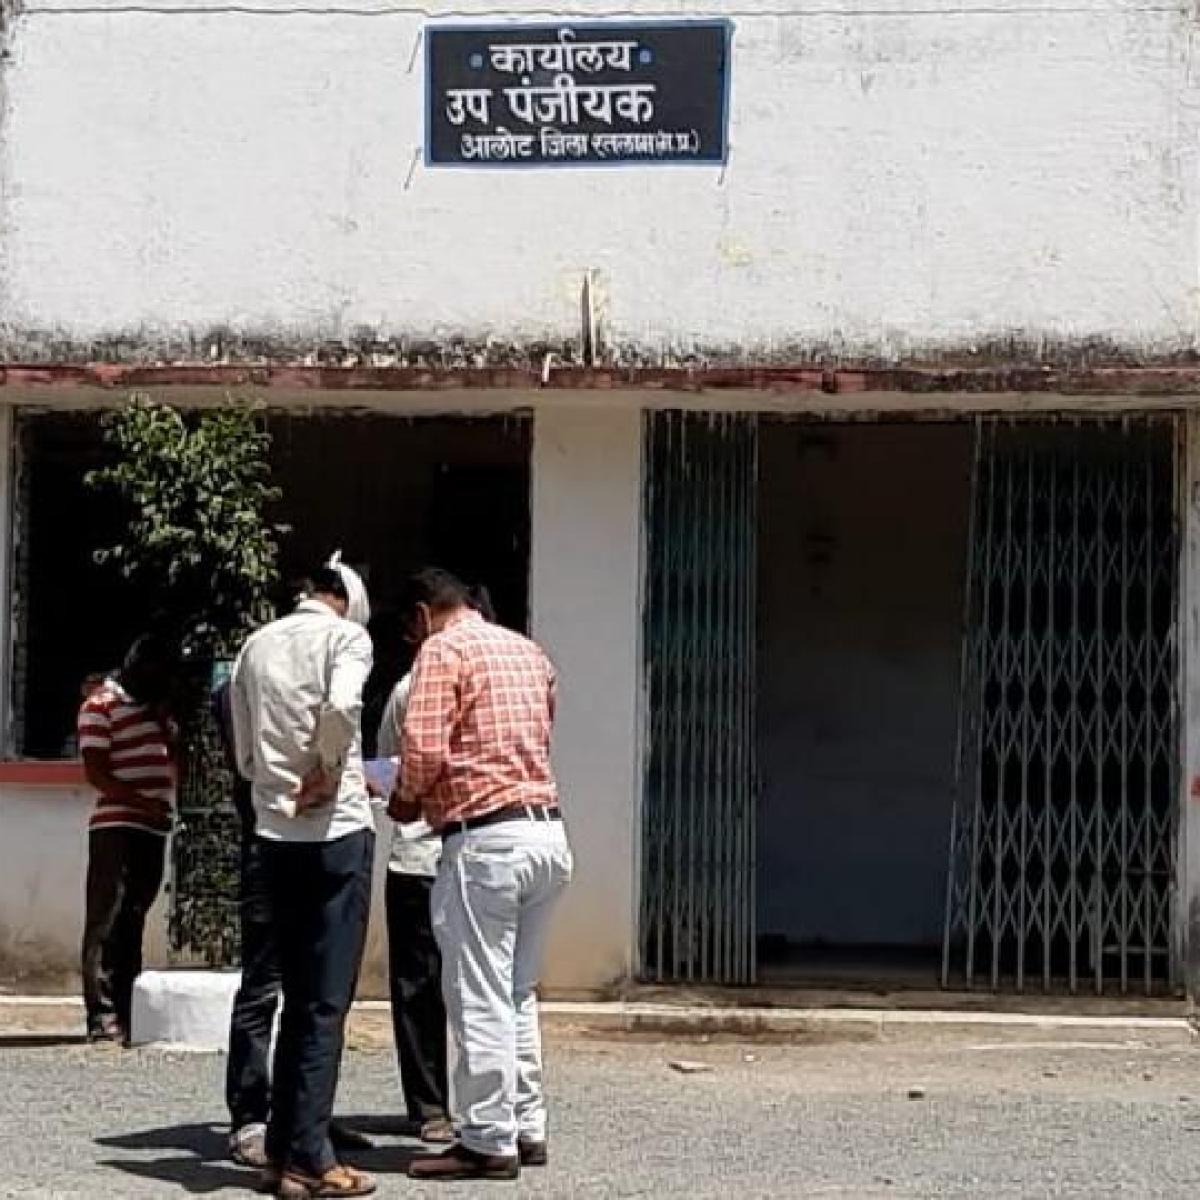 Madhya Pradesh: Deputy registrar arrived from Indore skips self-quarantine, resumes office in Alot